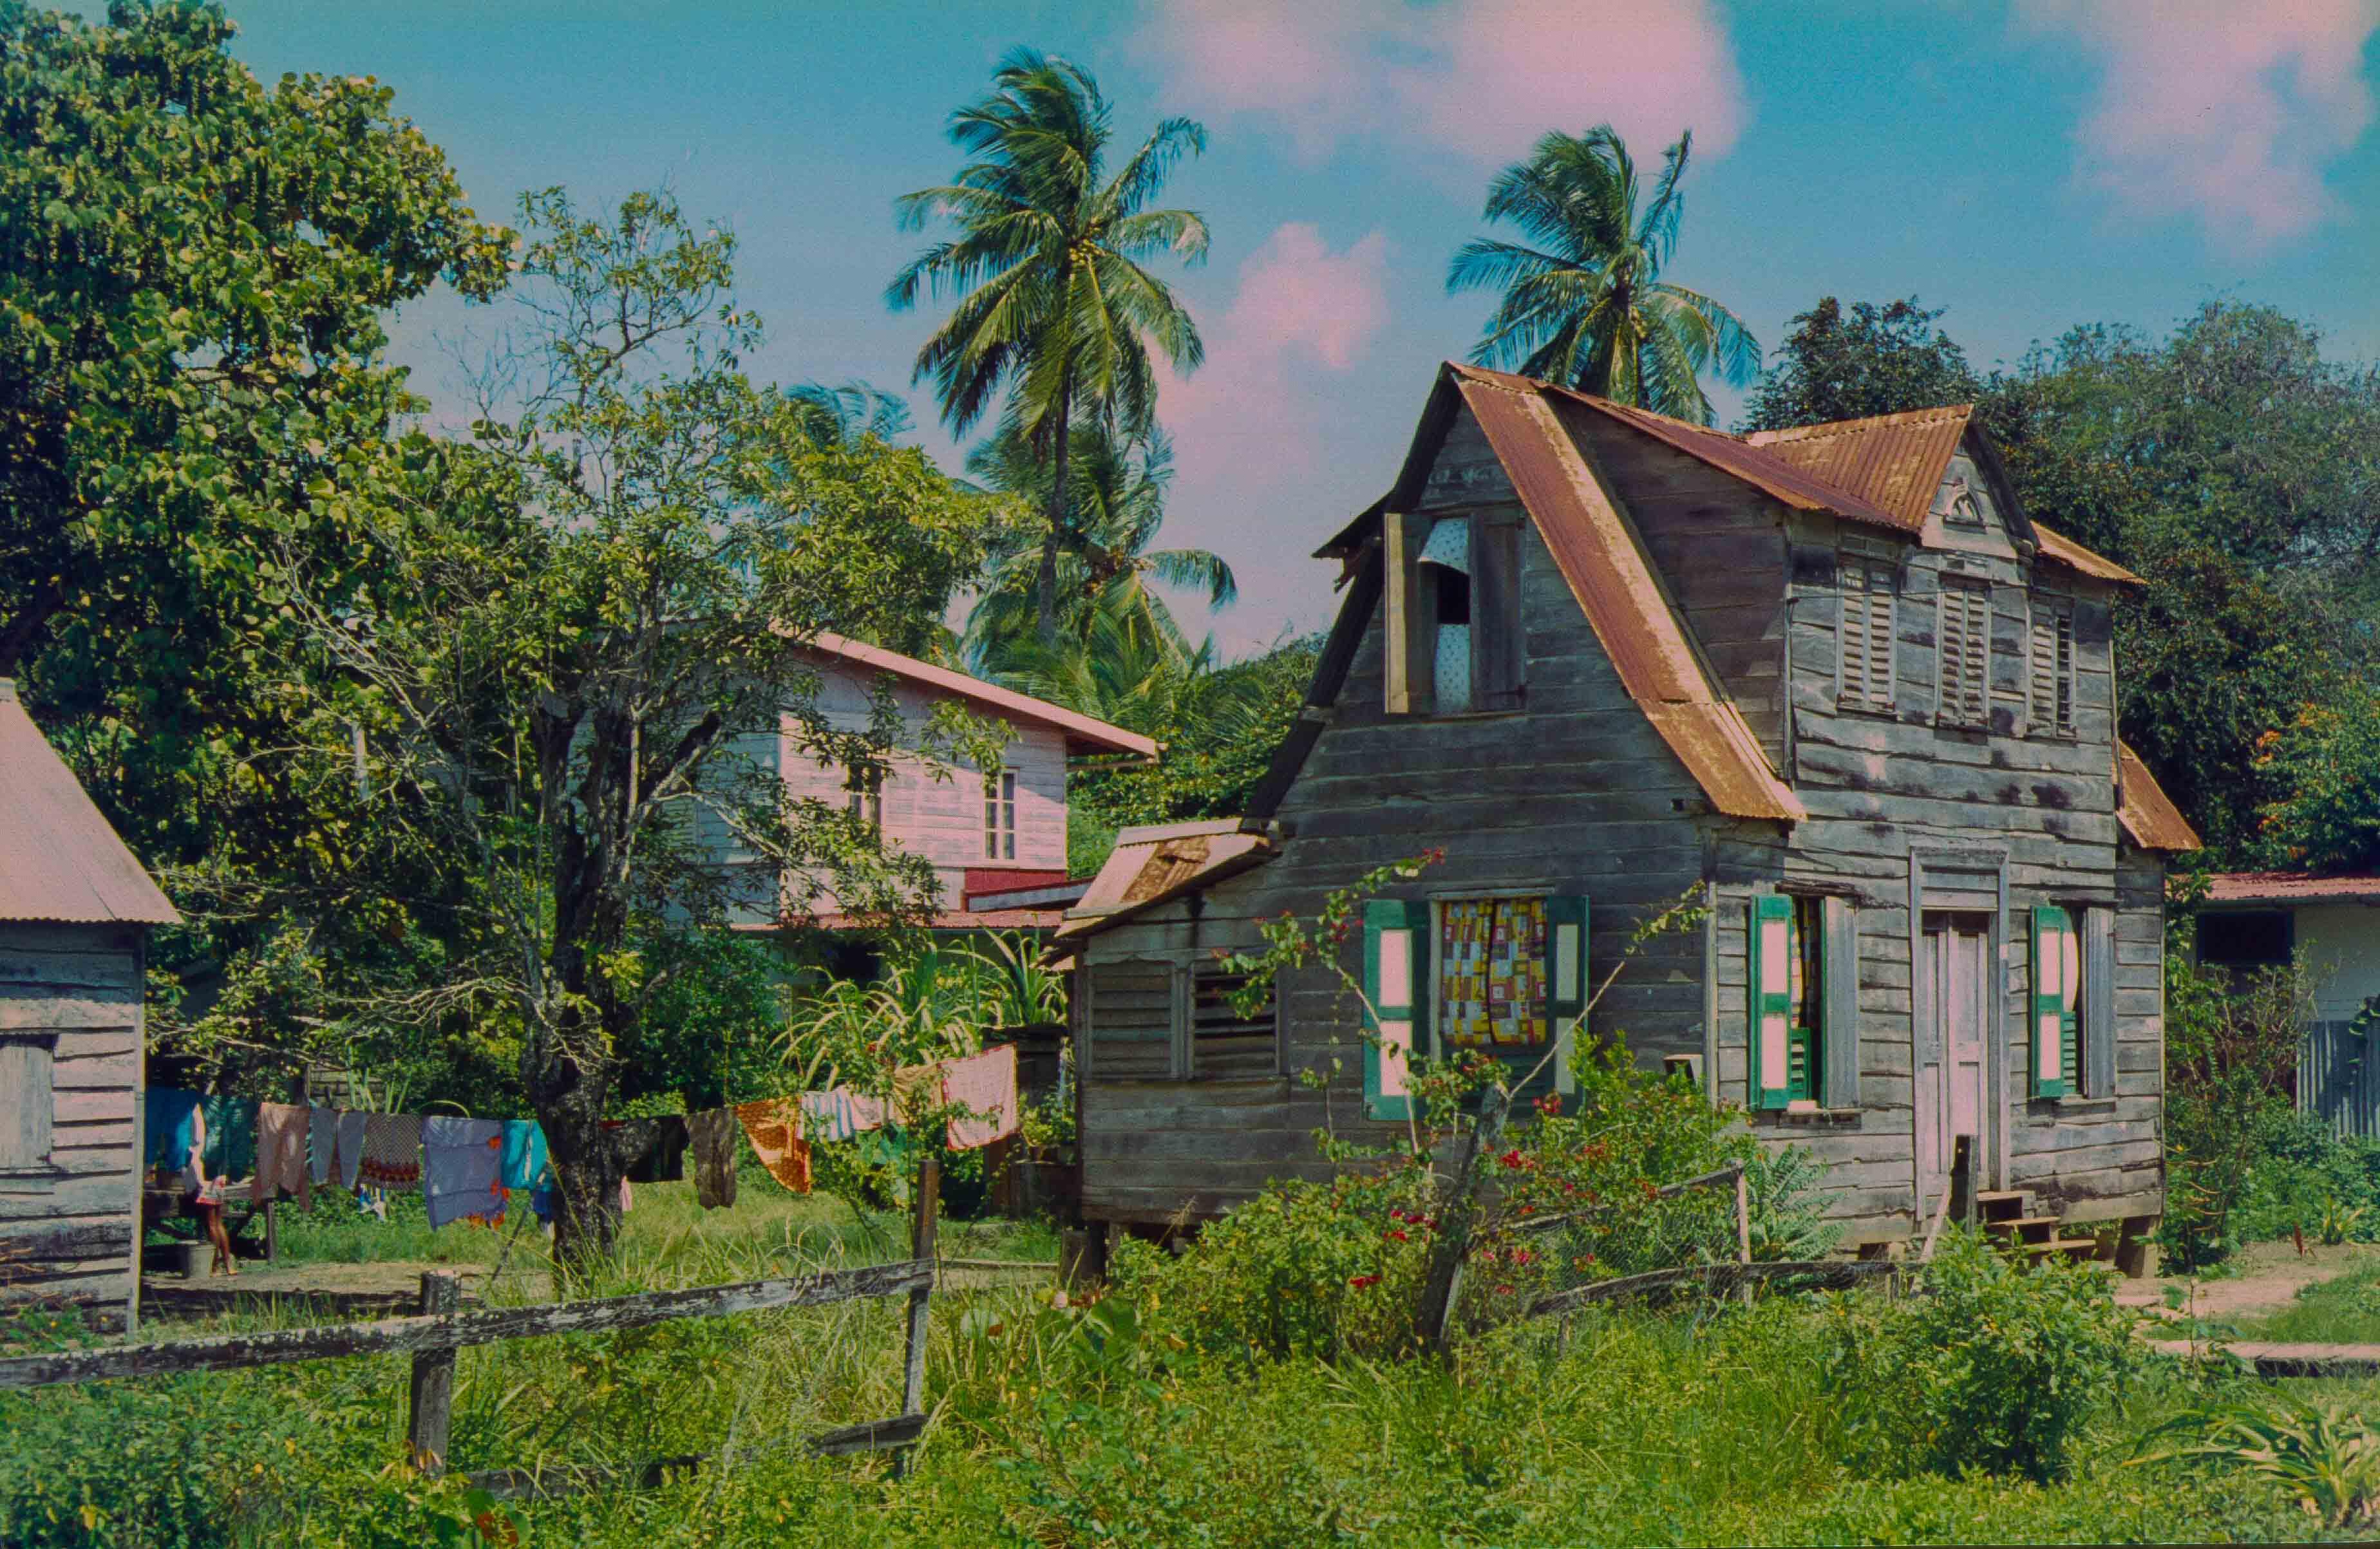 337. Suriname